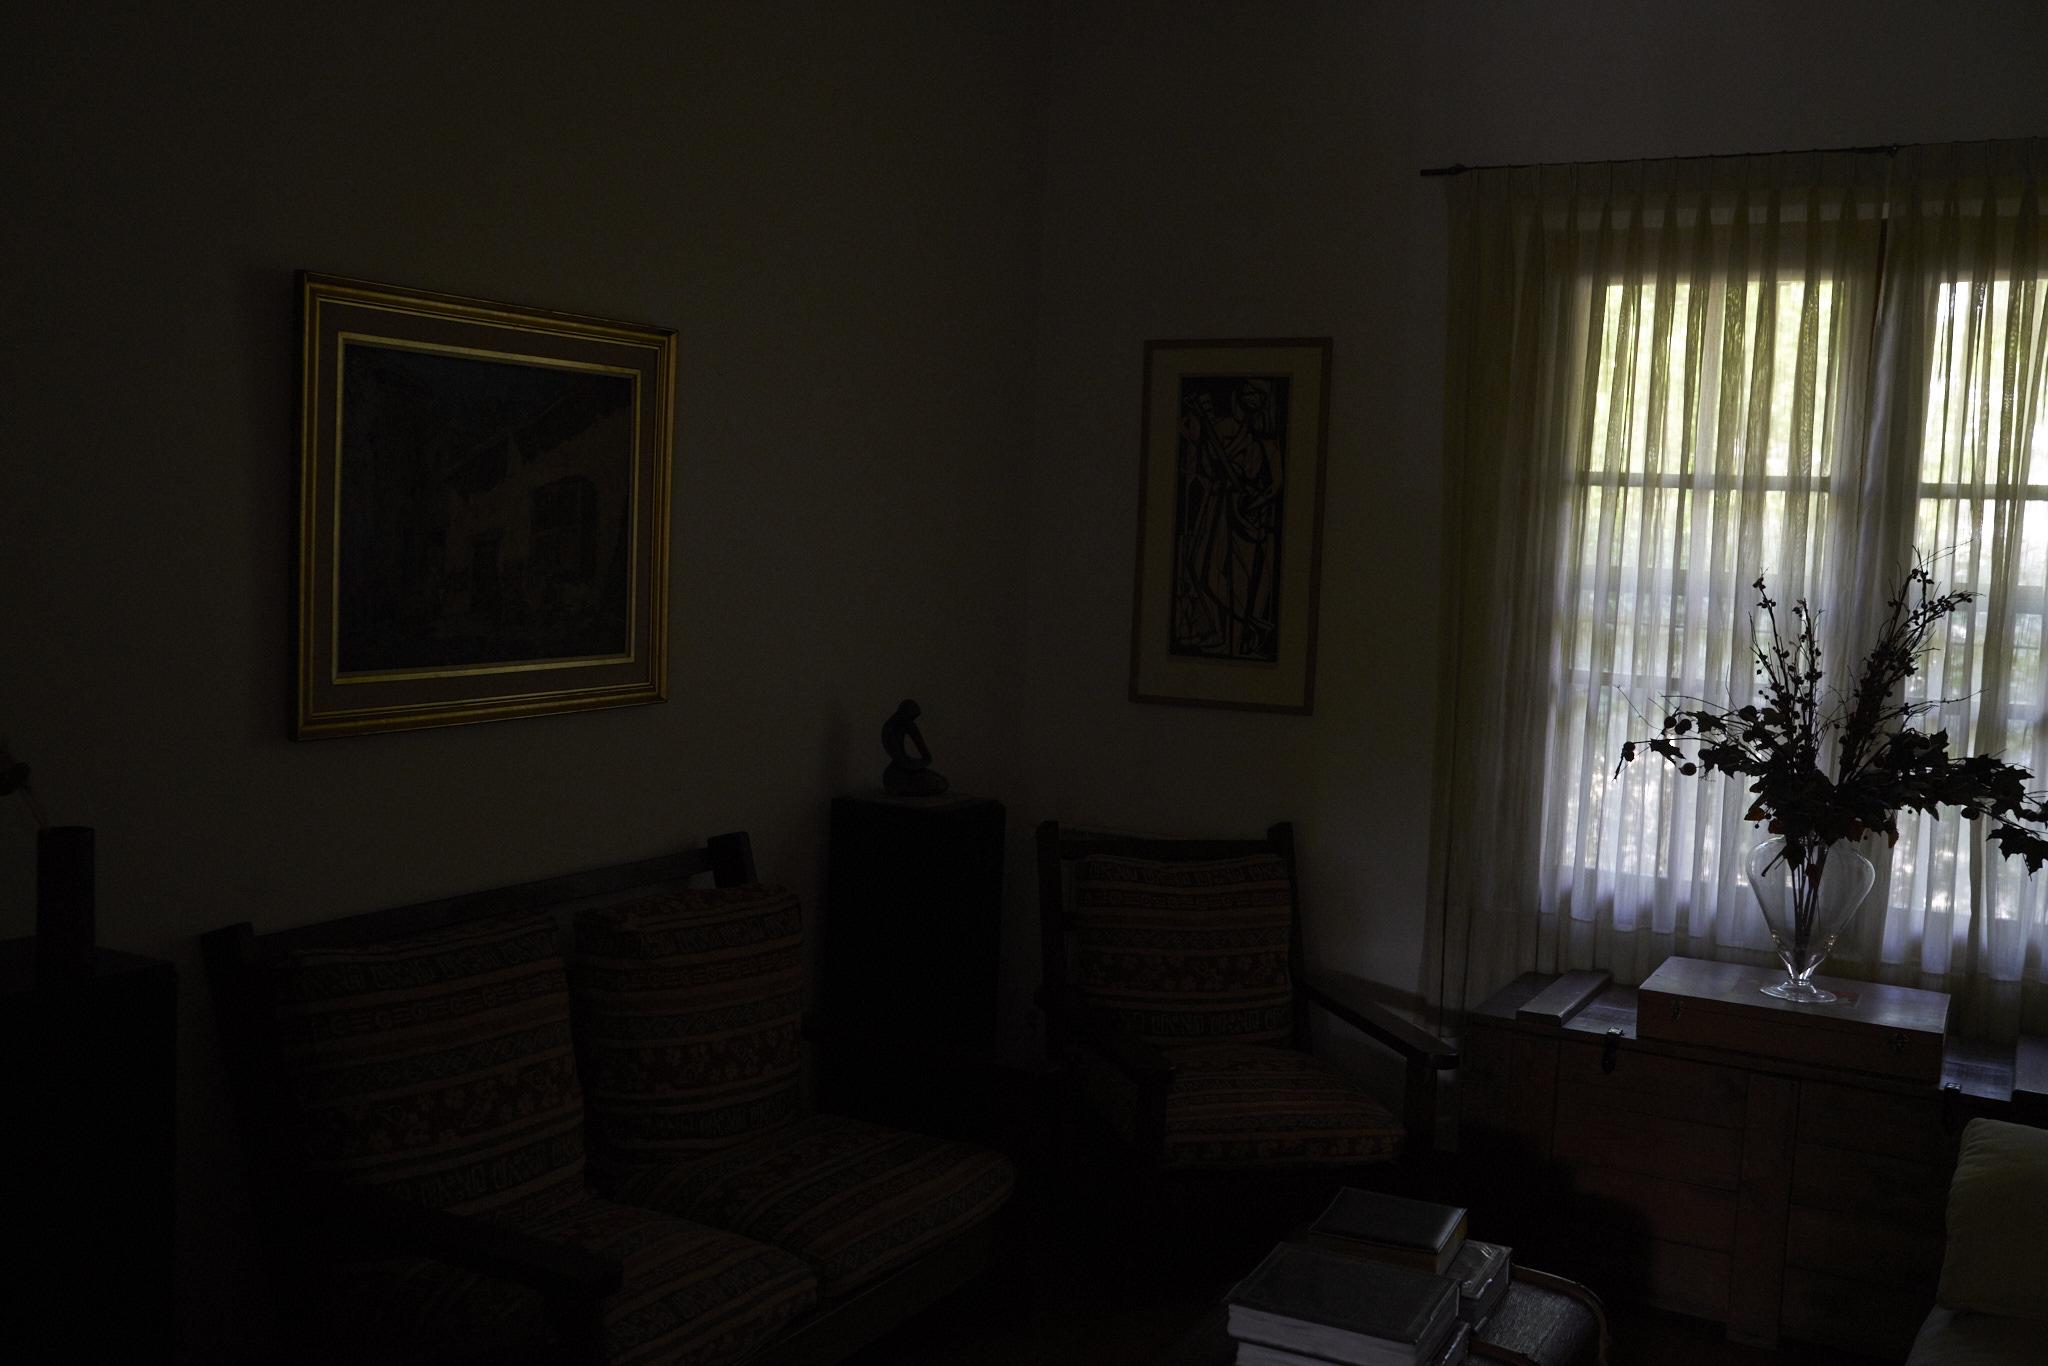 Fotografo de Casamientos - Bodas en Tucson - Cordoba DSC05959.jpg